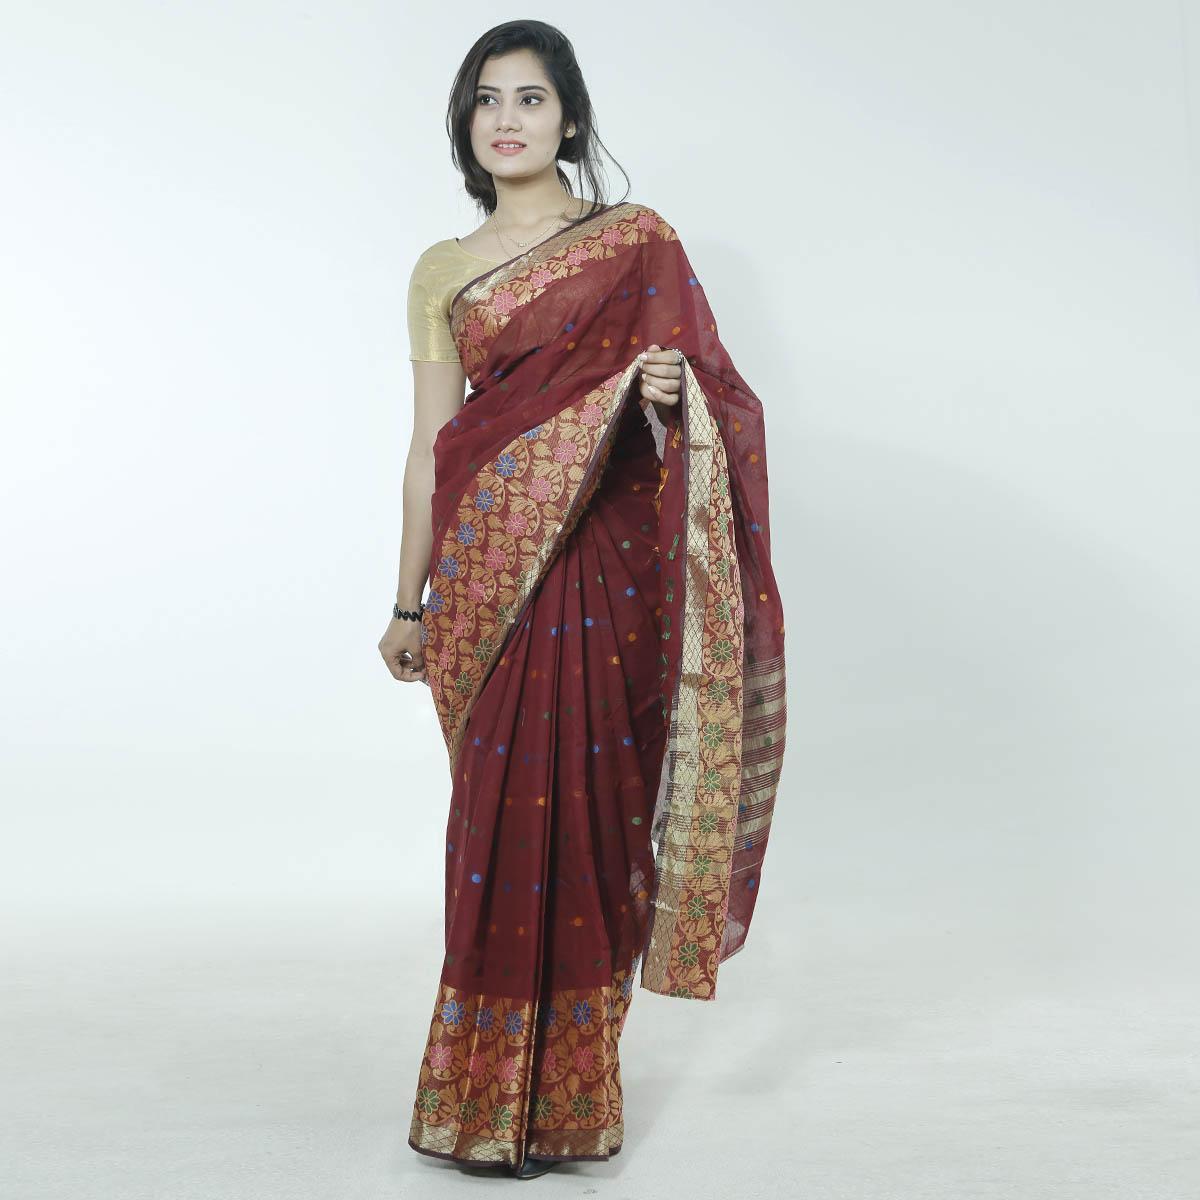 94eccdfd24 Designer Sarees Online - Bangladeshi Saree Collection 2019 - Daraz